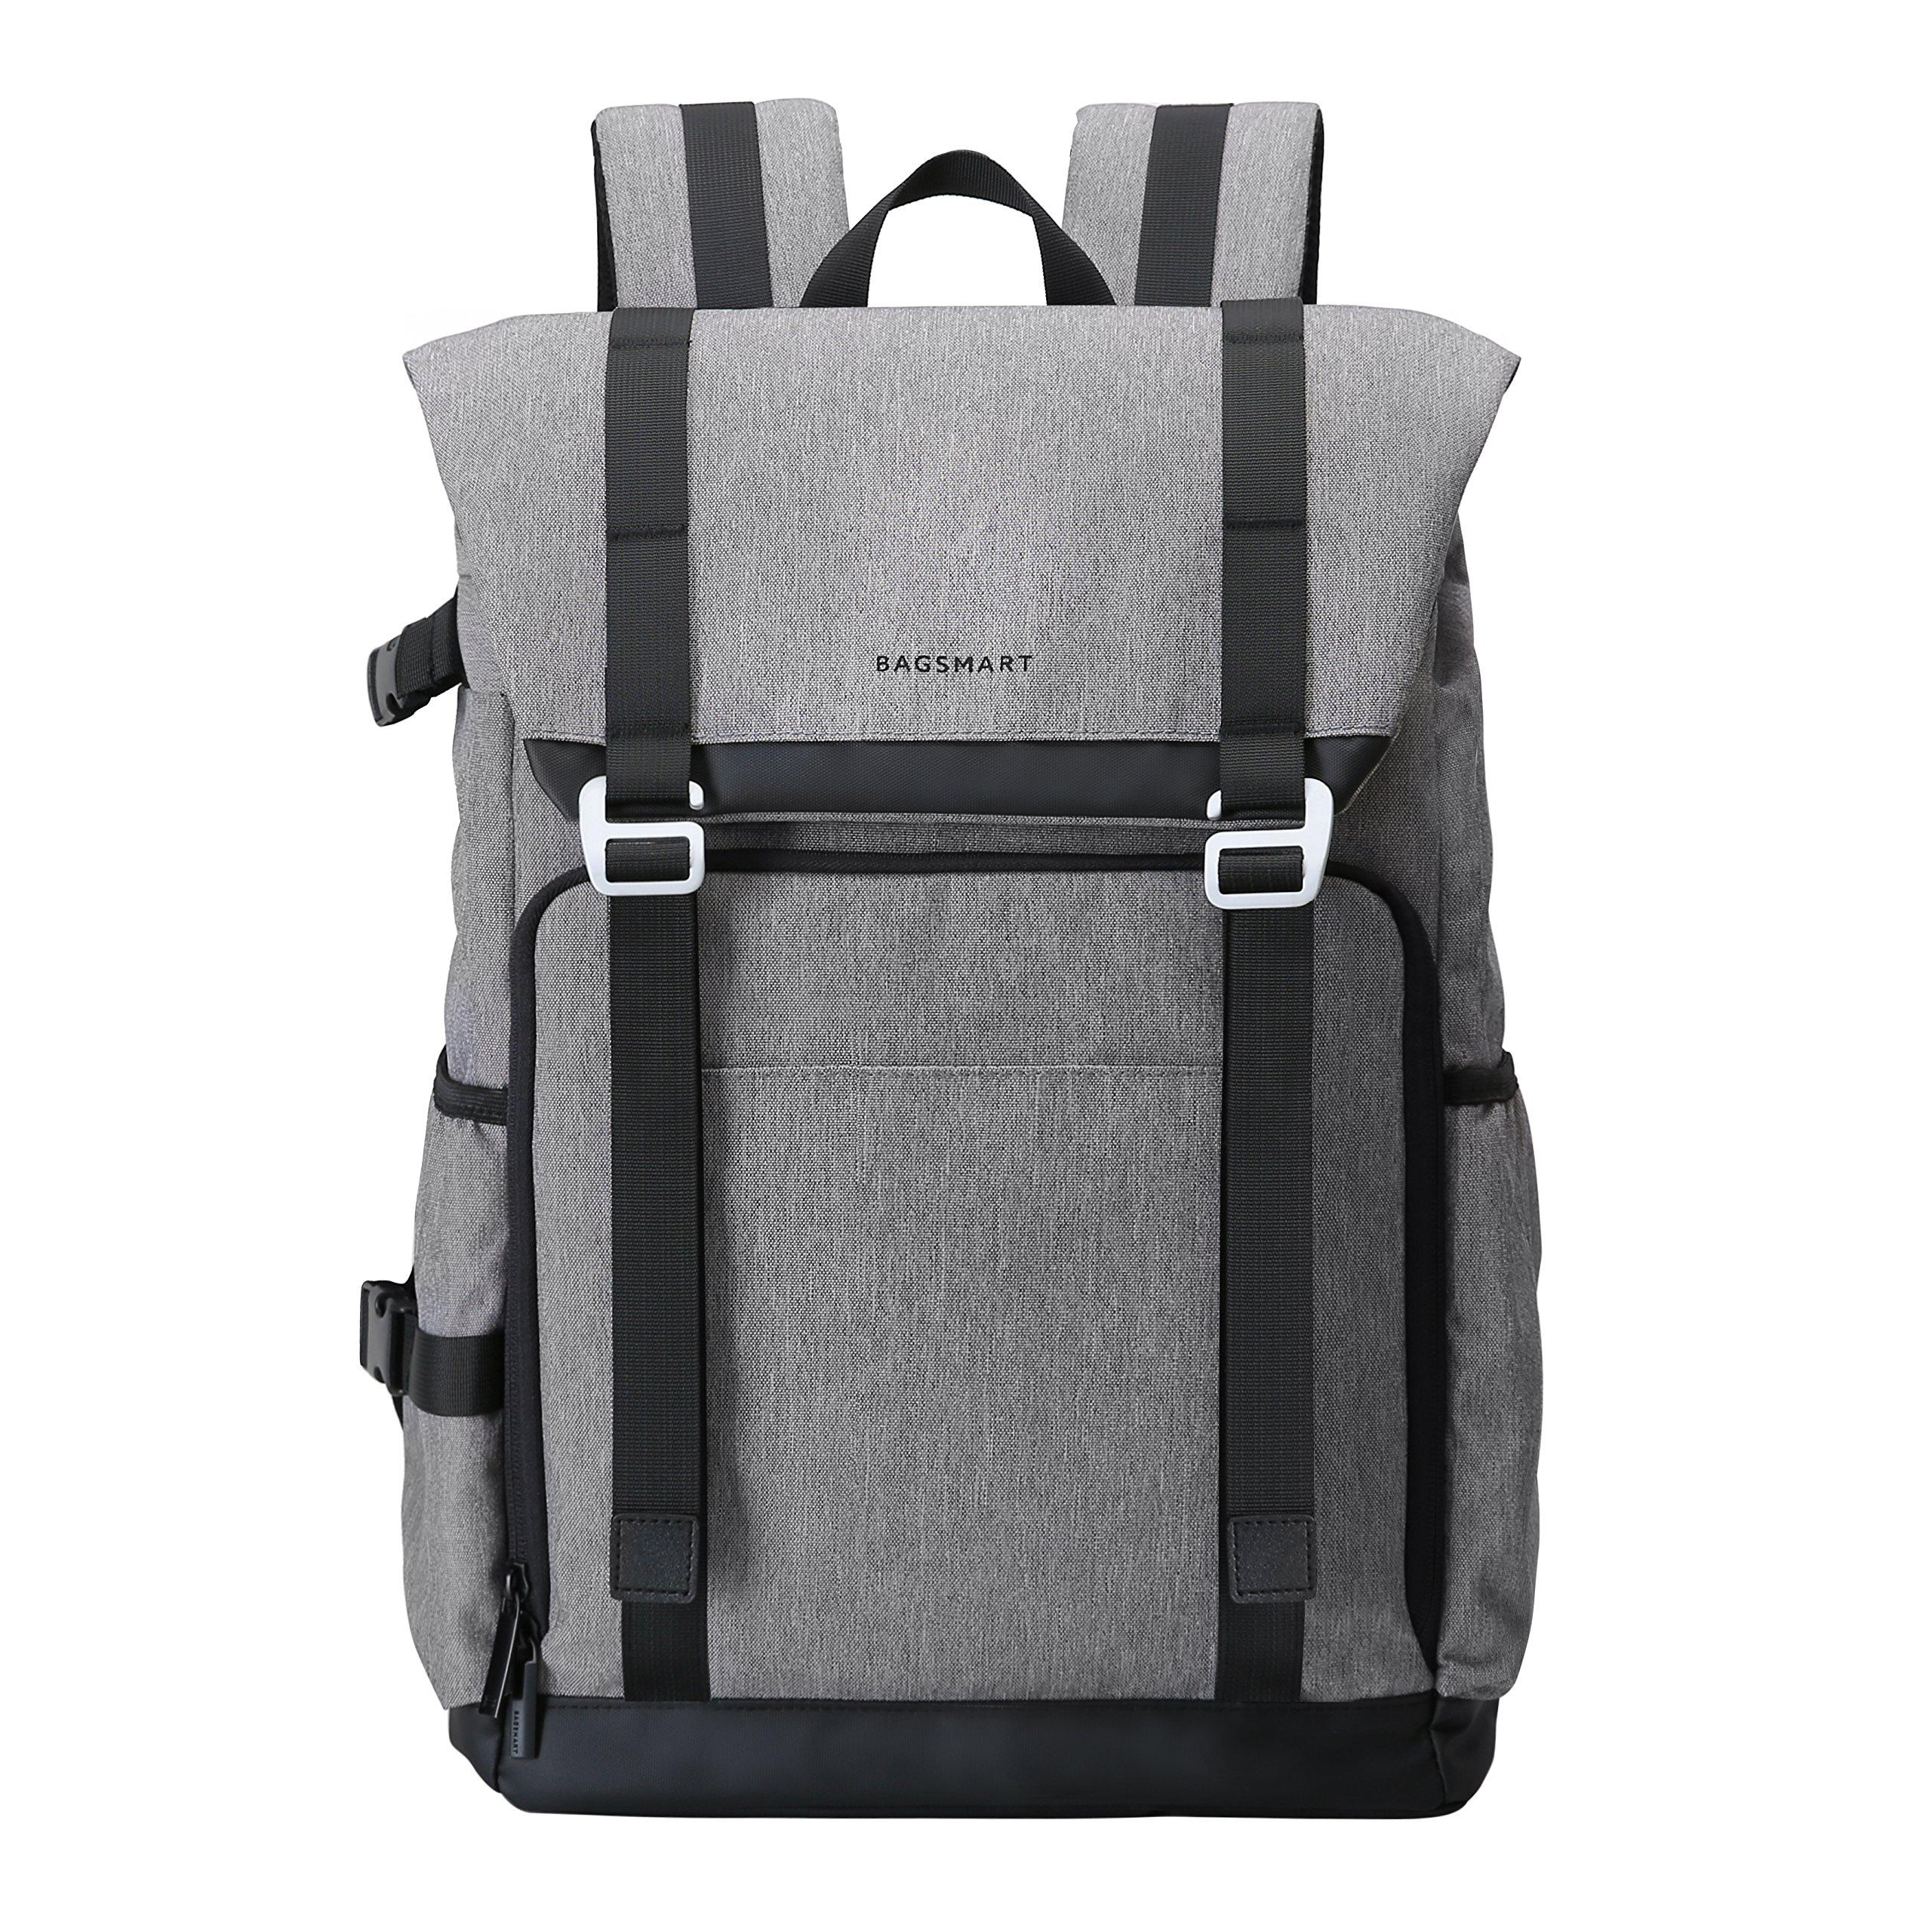 BAGSMART Camera Backpack for SLR/DSLR Cameras & 15'' Laptop with Waterproof Rain Cover & Tripod Holder, Grey